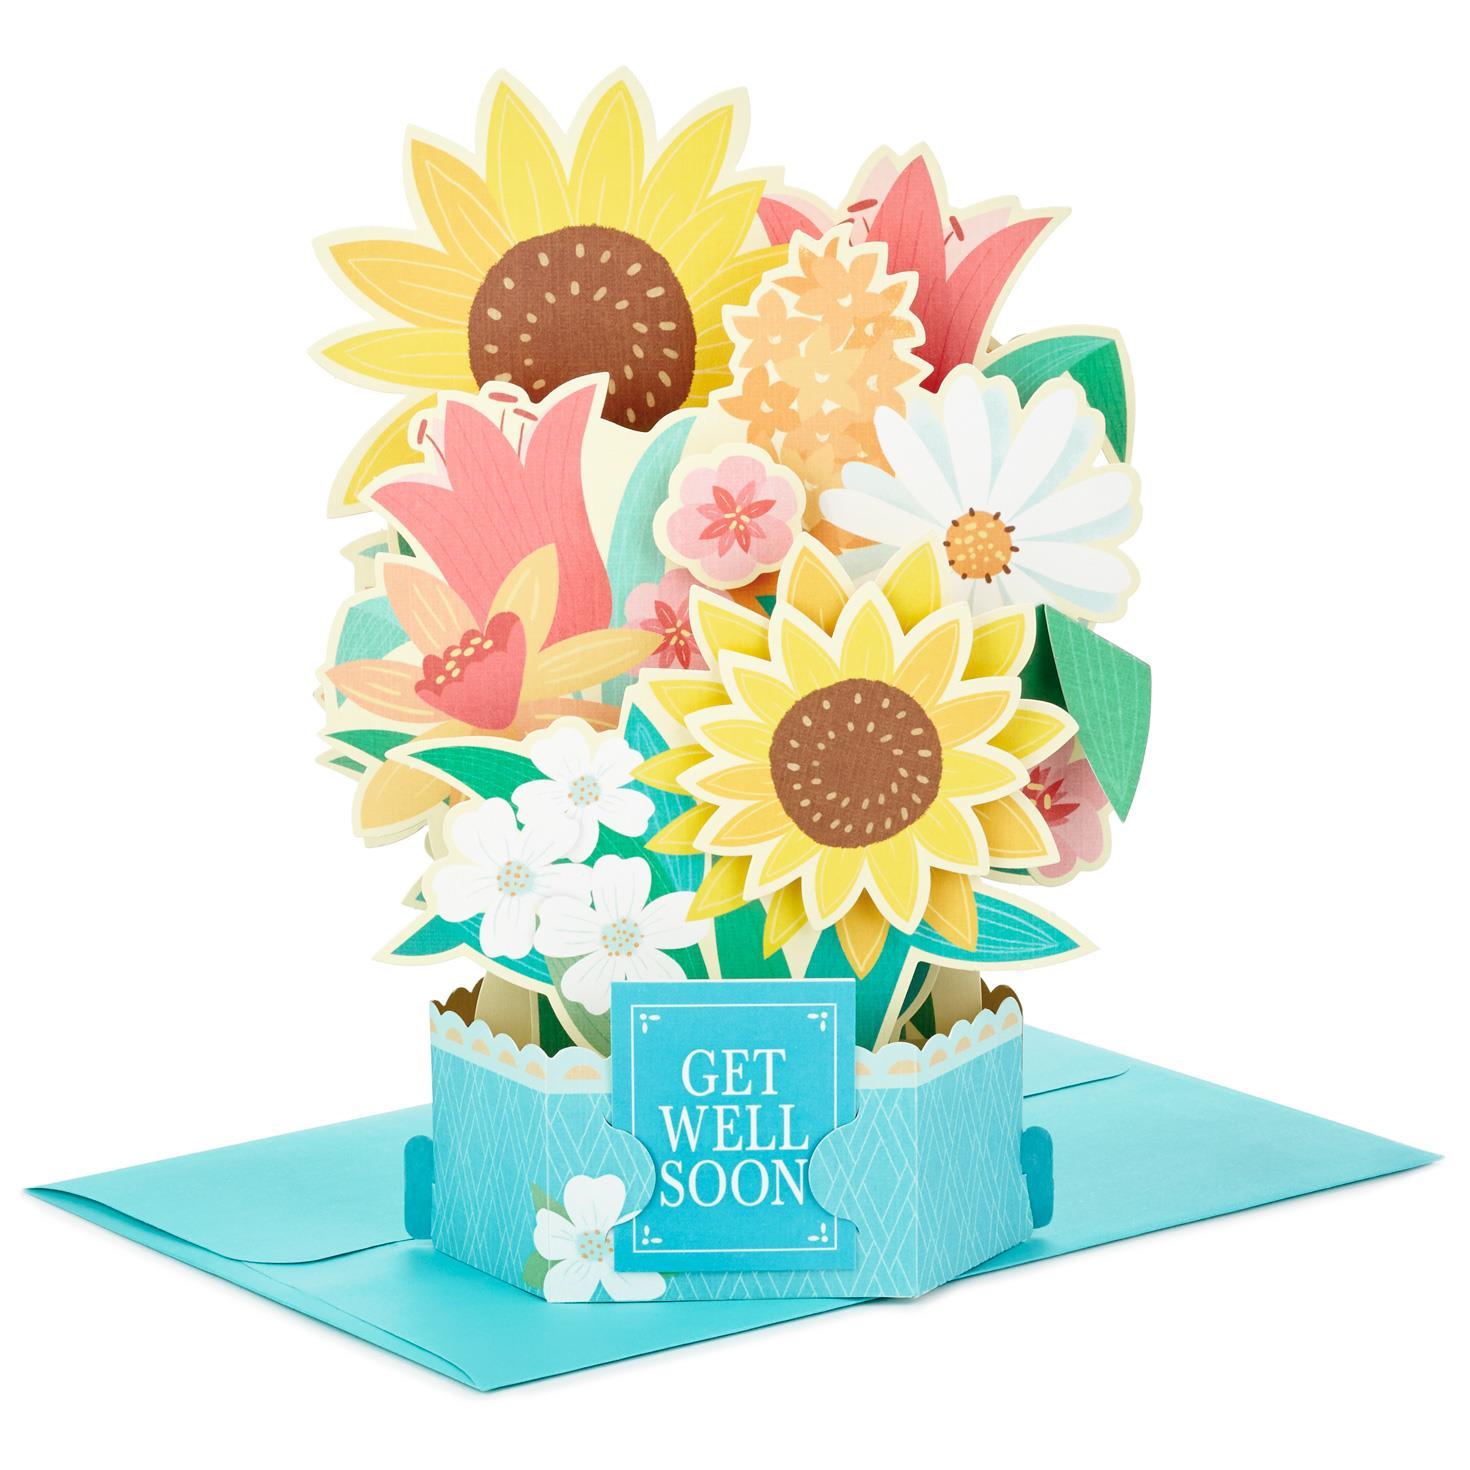 Sunflower Bouquet Pop Up Get Well Card - Greeting Cards - Hallmark